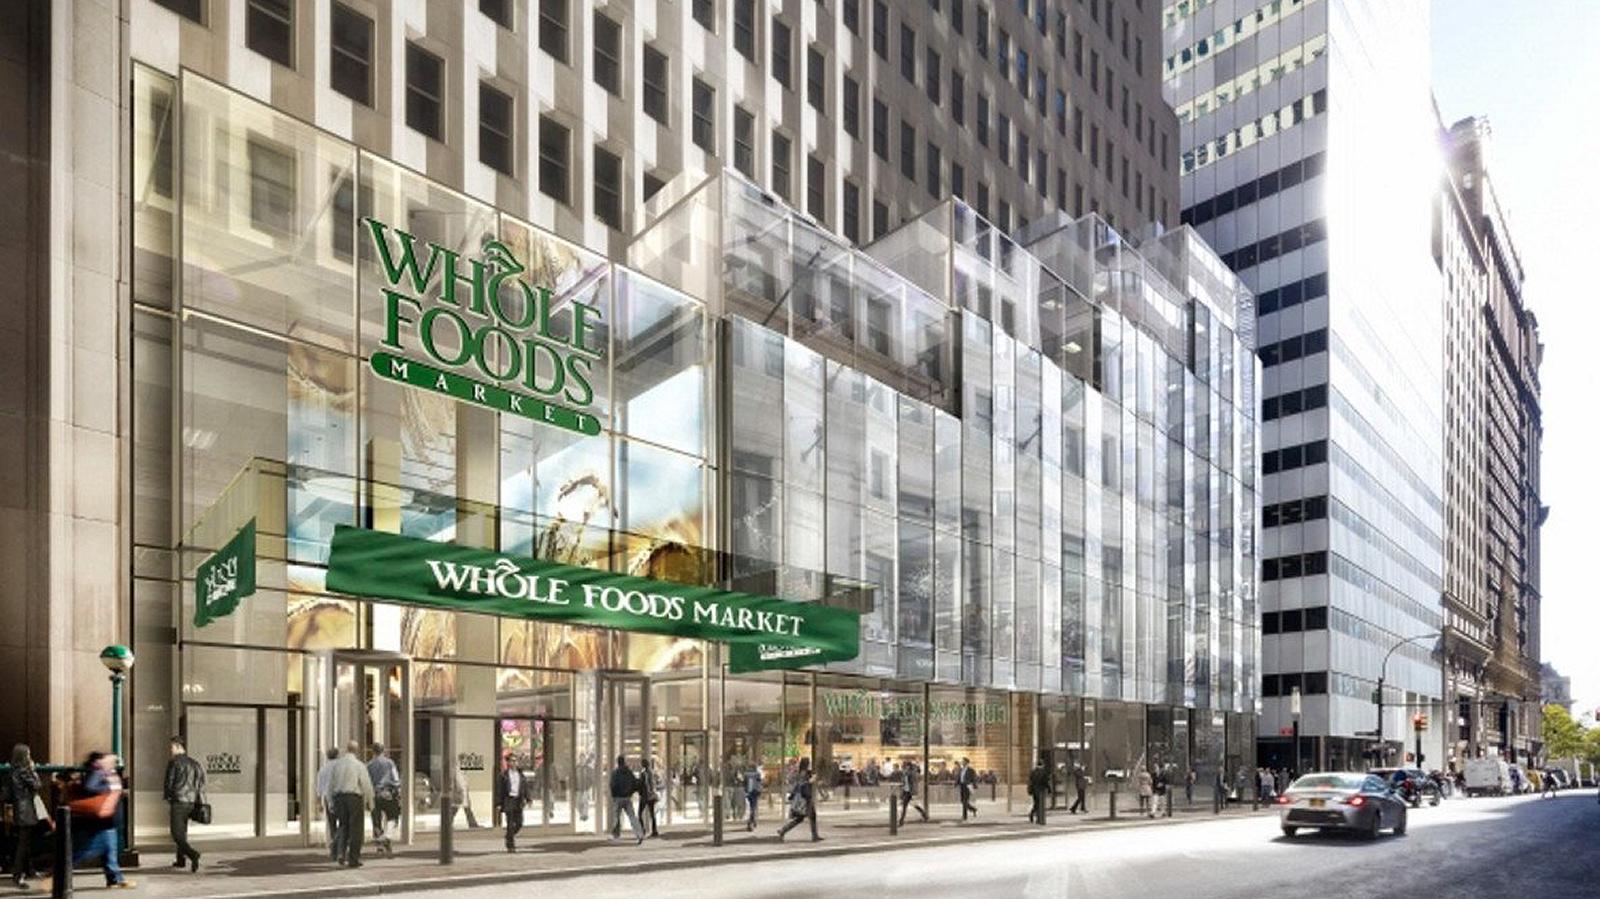 One Wall Street, 1 Wall Street